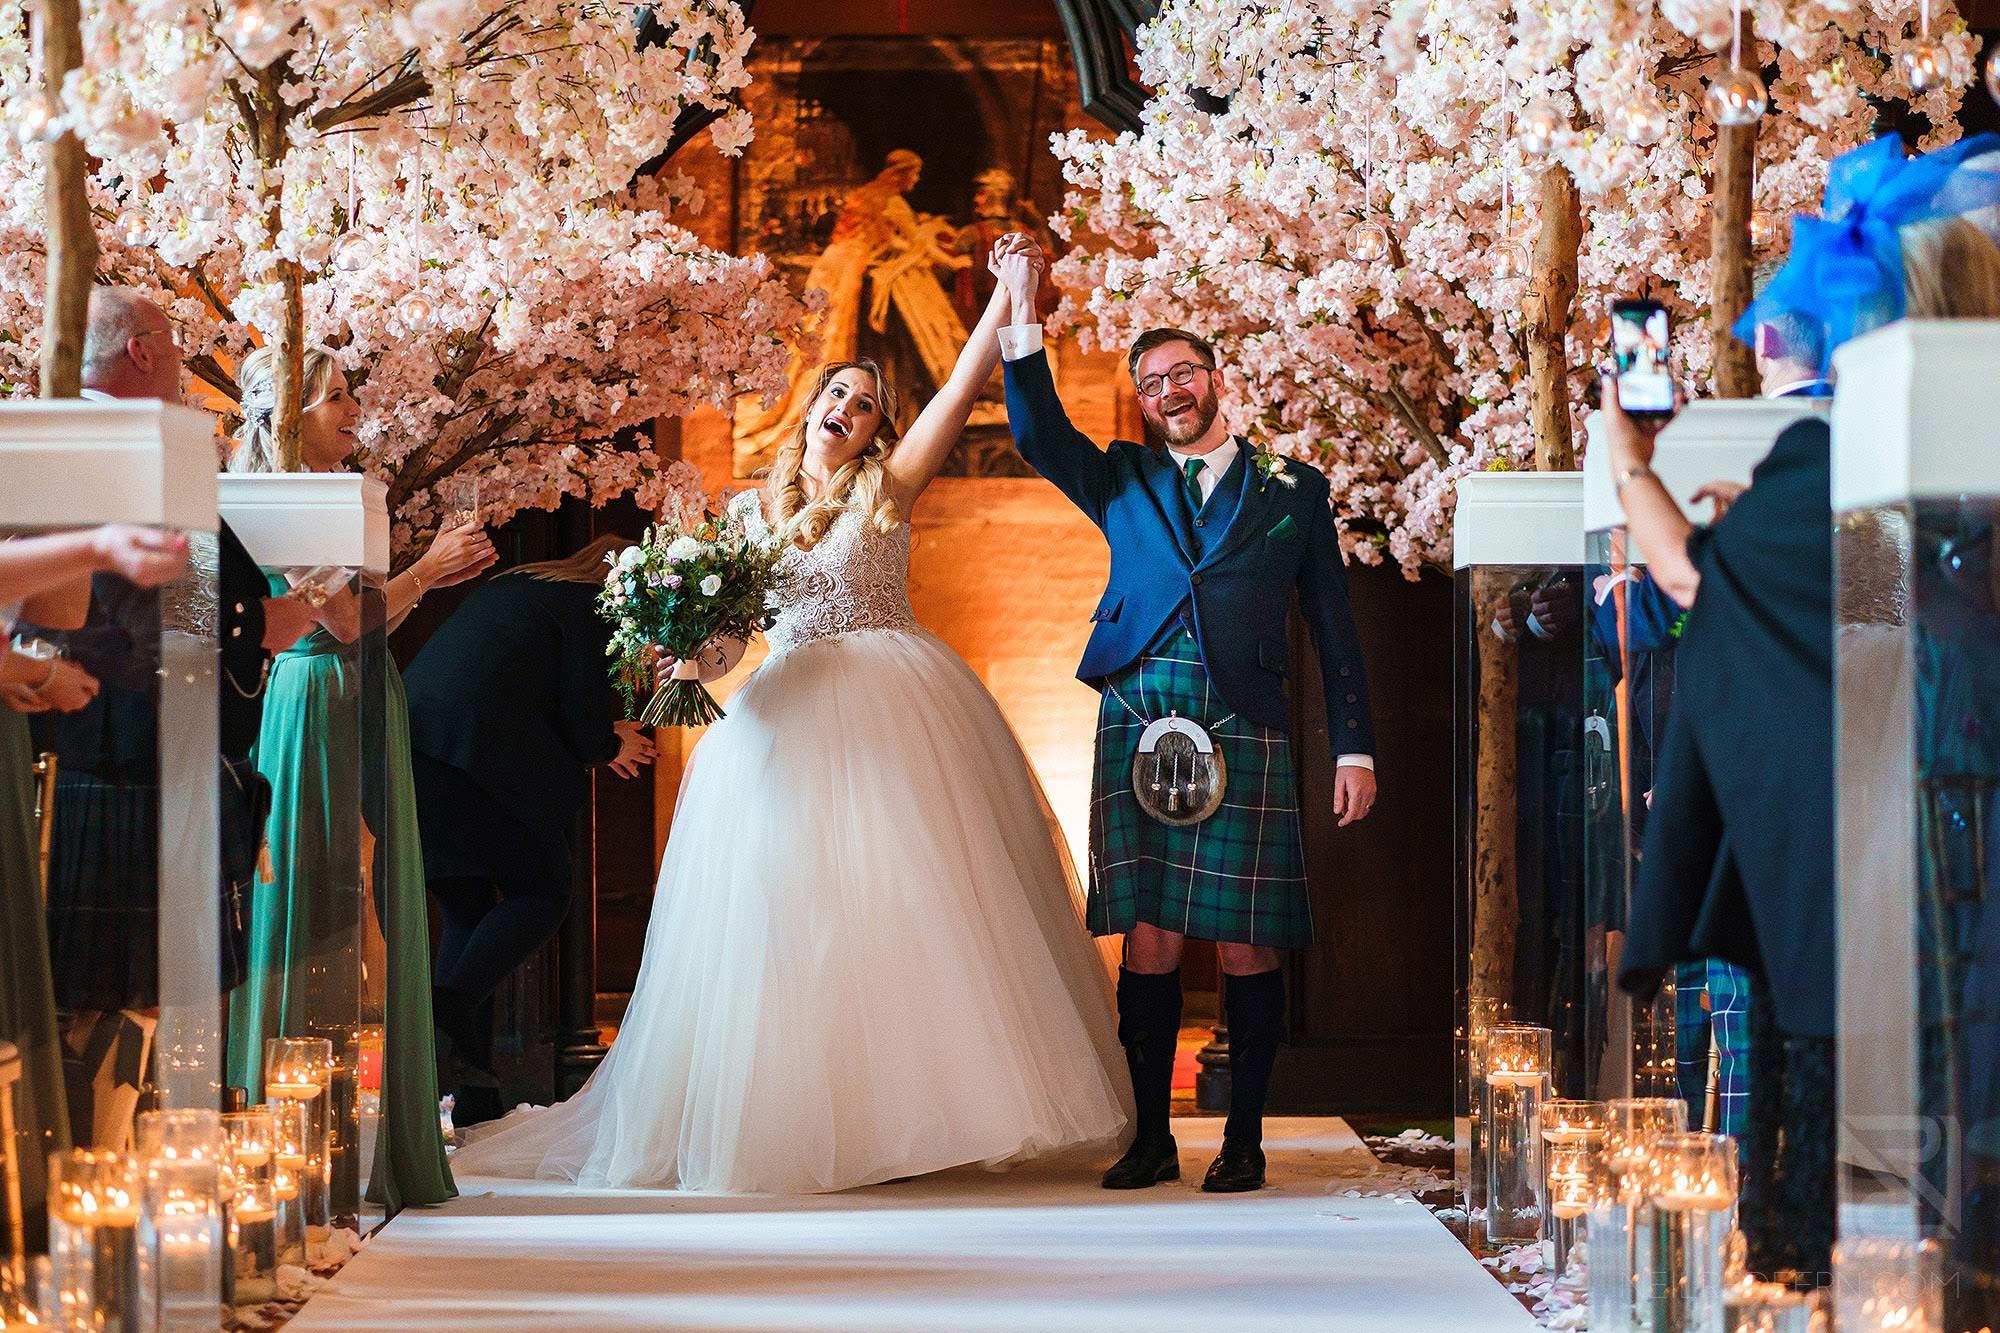 bride and groom celebrating during wedding ceremony